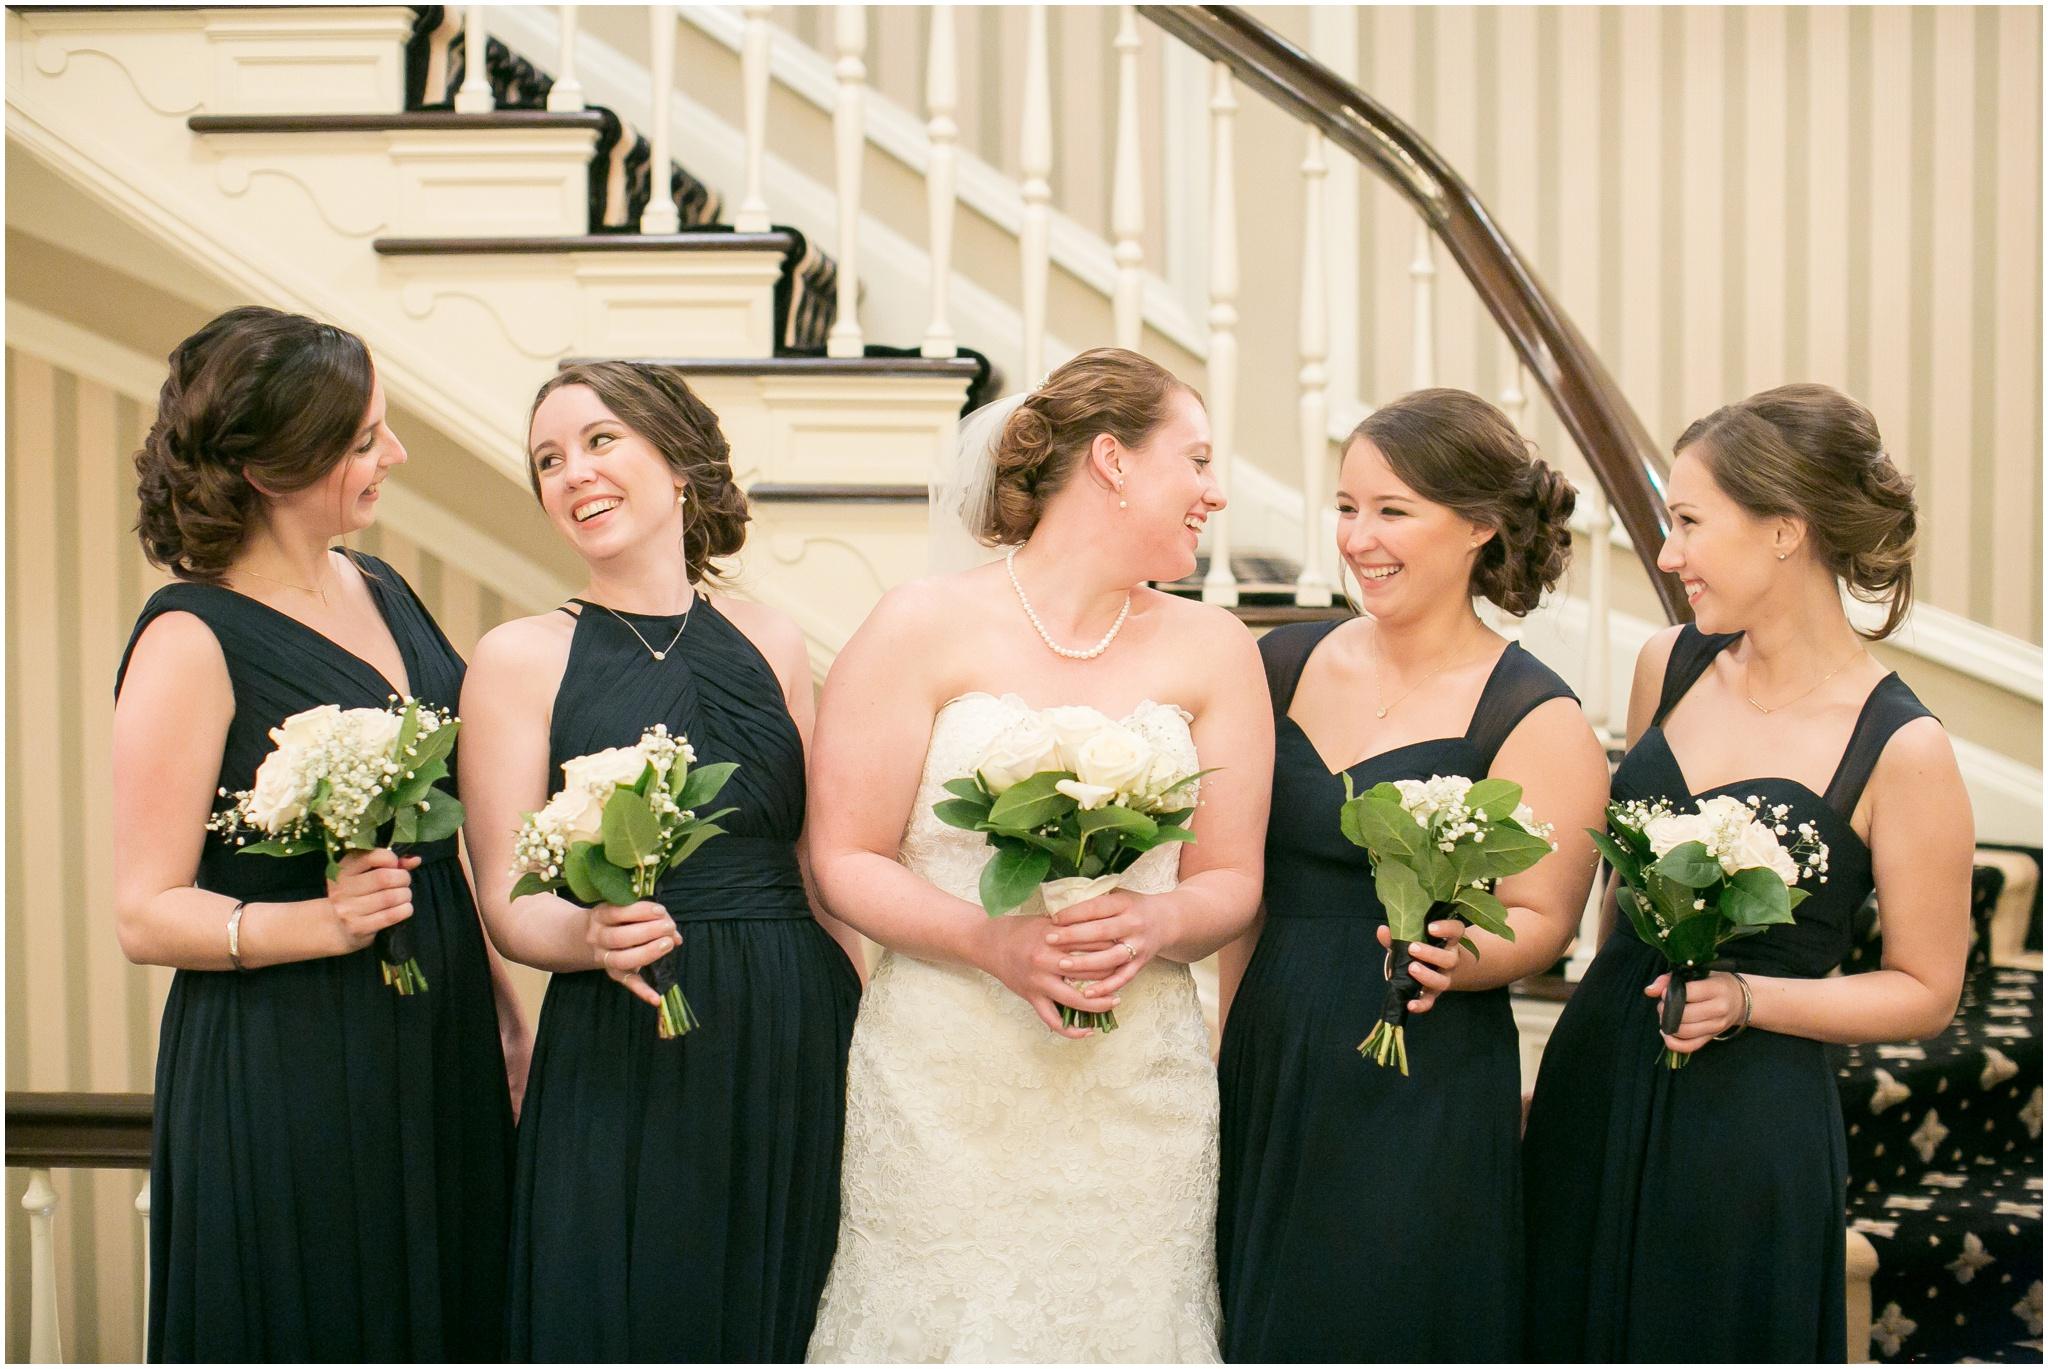 Madison_Club_Madison_Wisconsin_Wedding_Photographer_Spring_Rainy_Wedding_2605.jpg